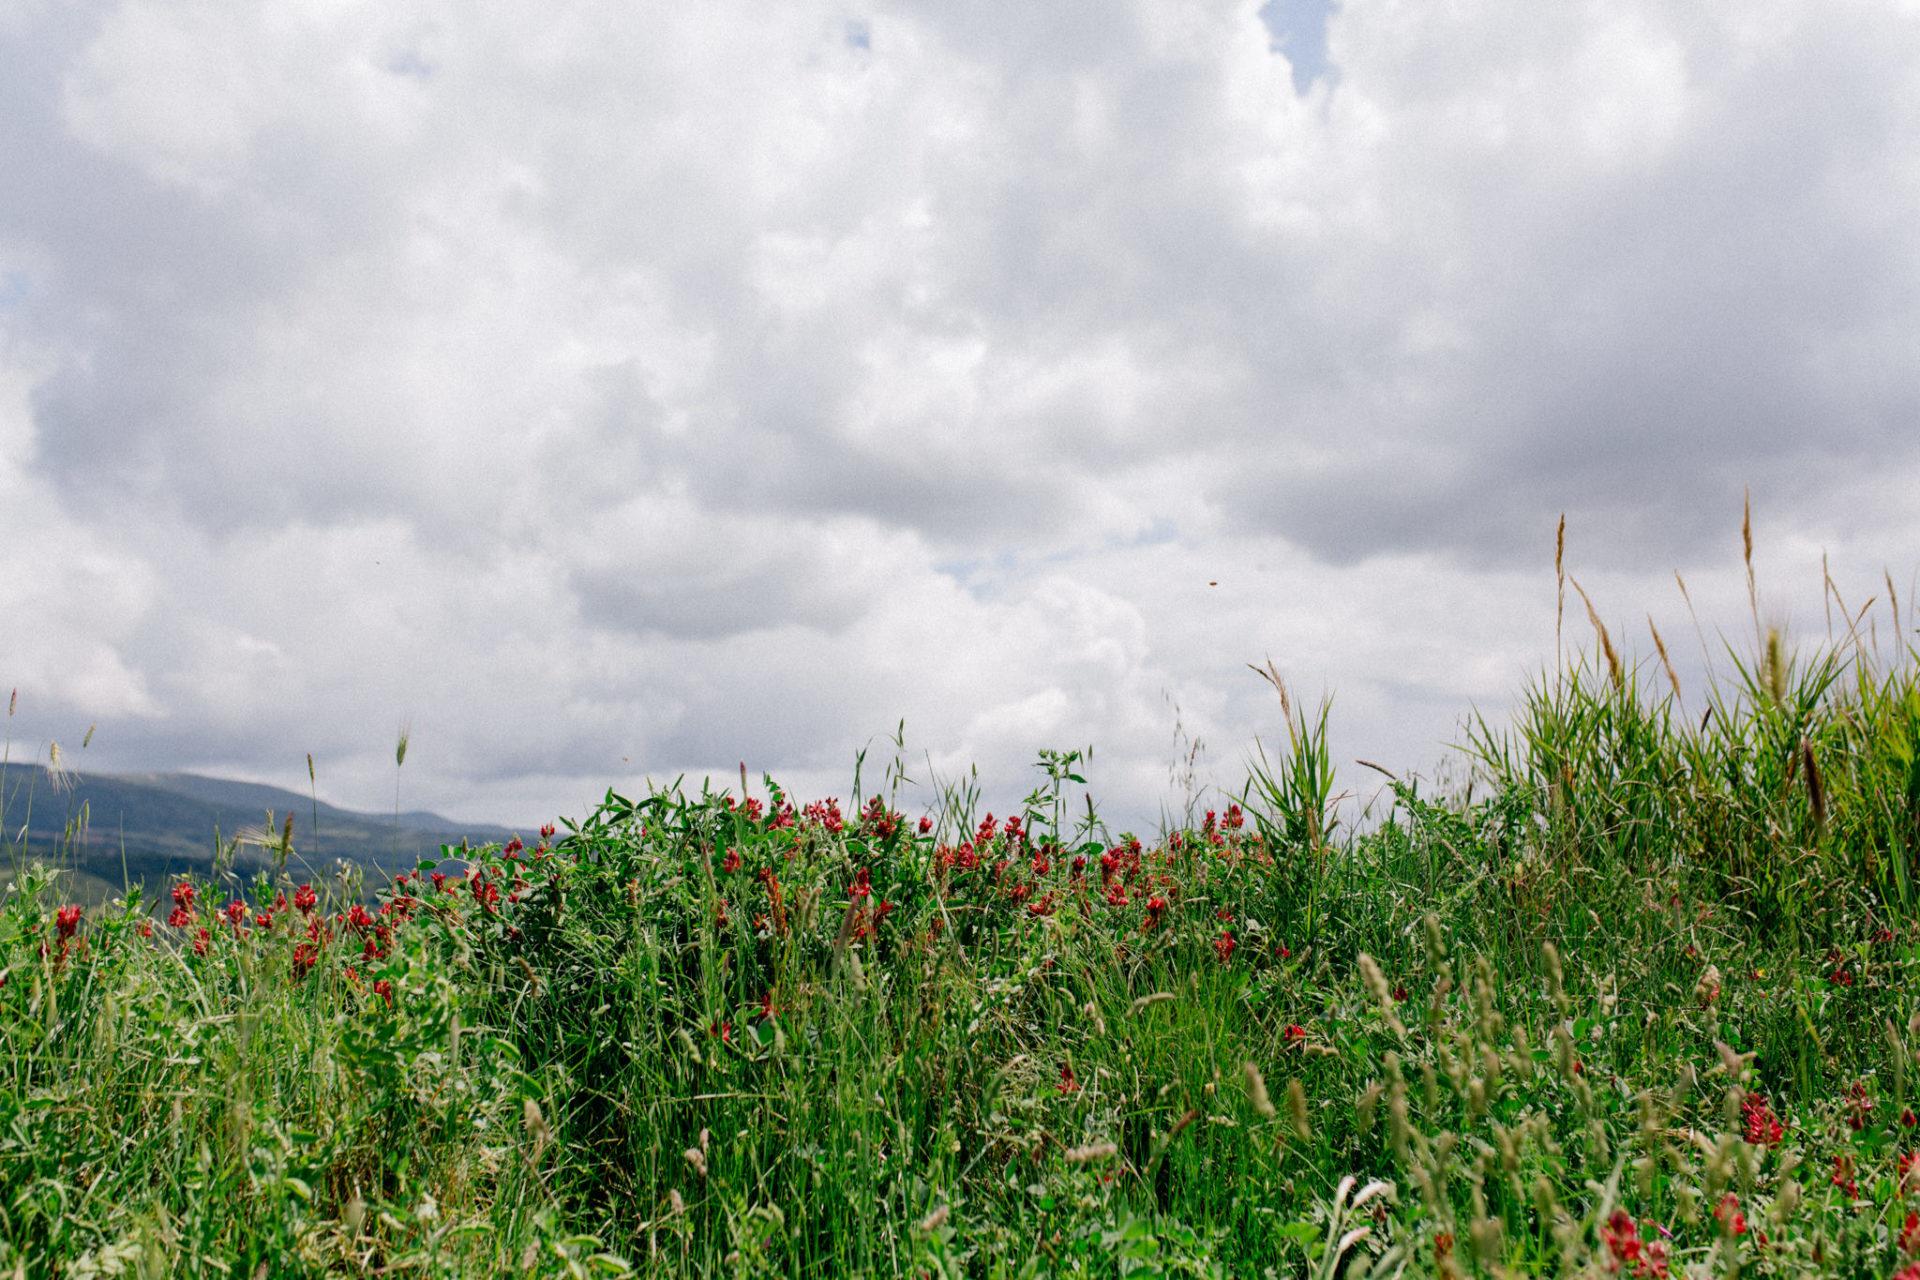 wedding photographer tuscany-italy road trip with dog-wild flowers-grosseto region